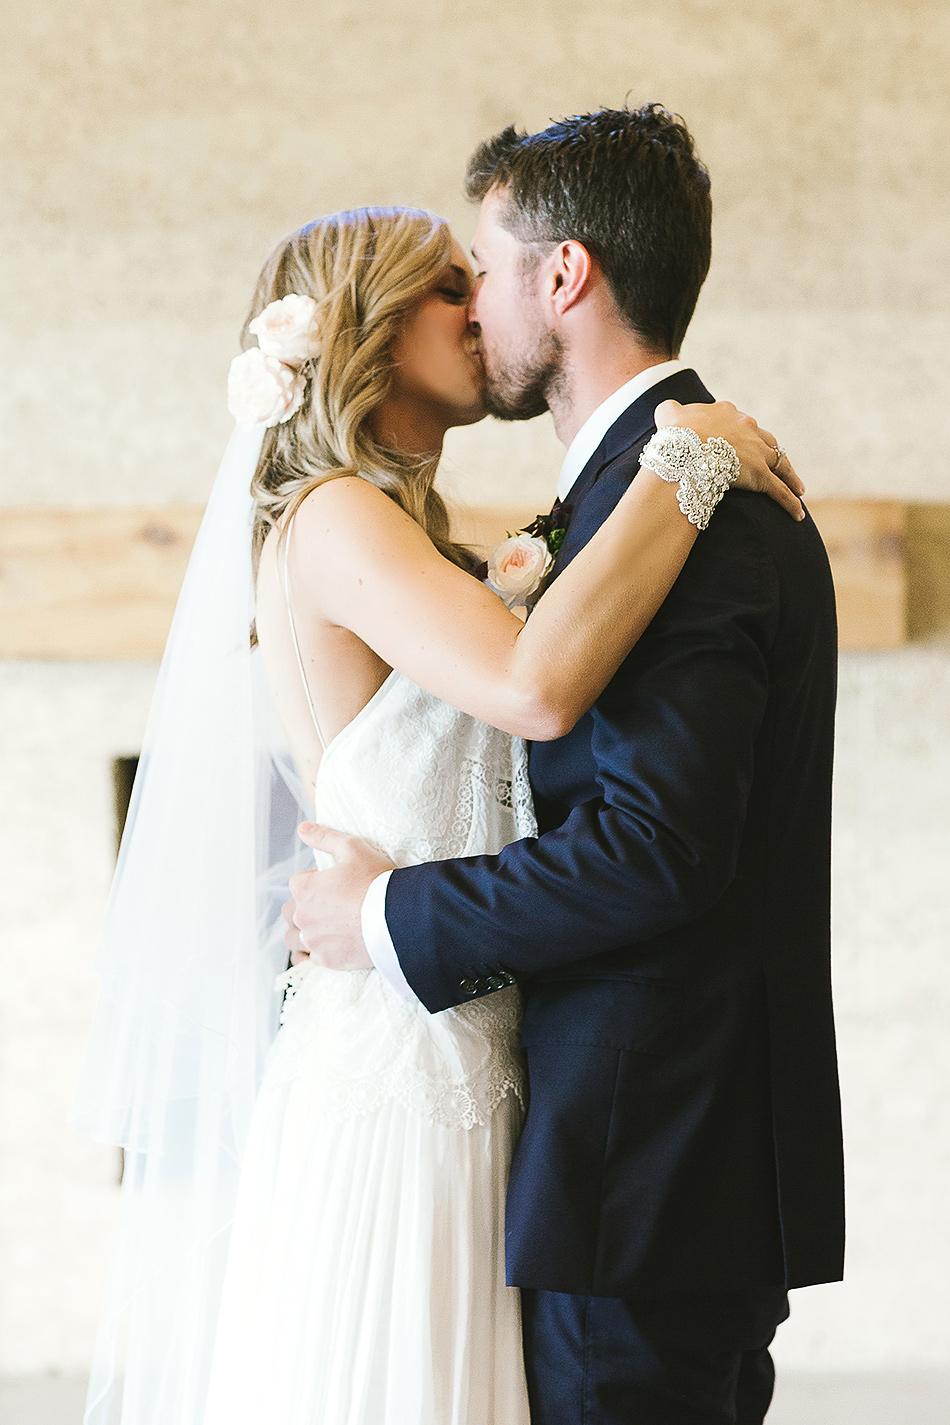 wedding ceremony at earth house byron bay